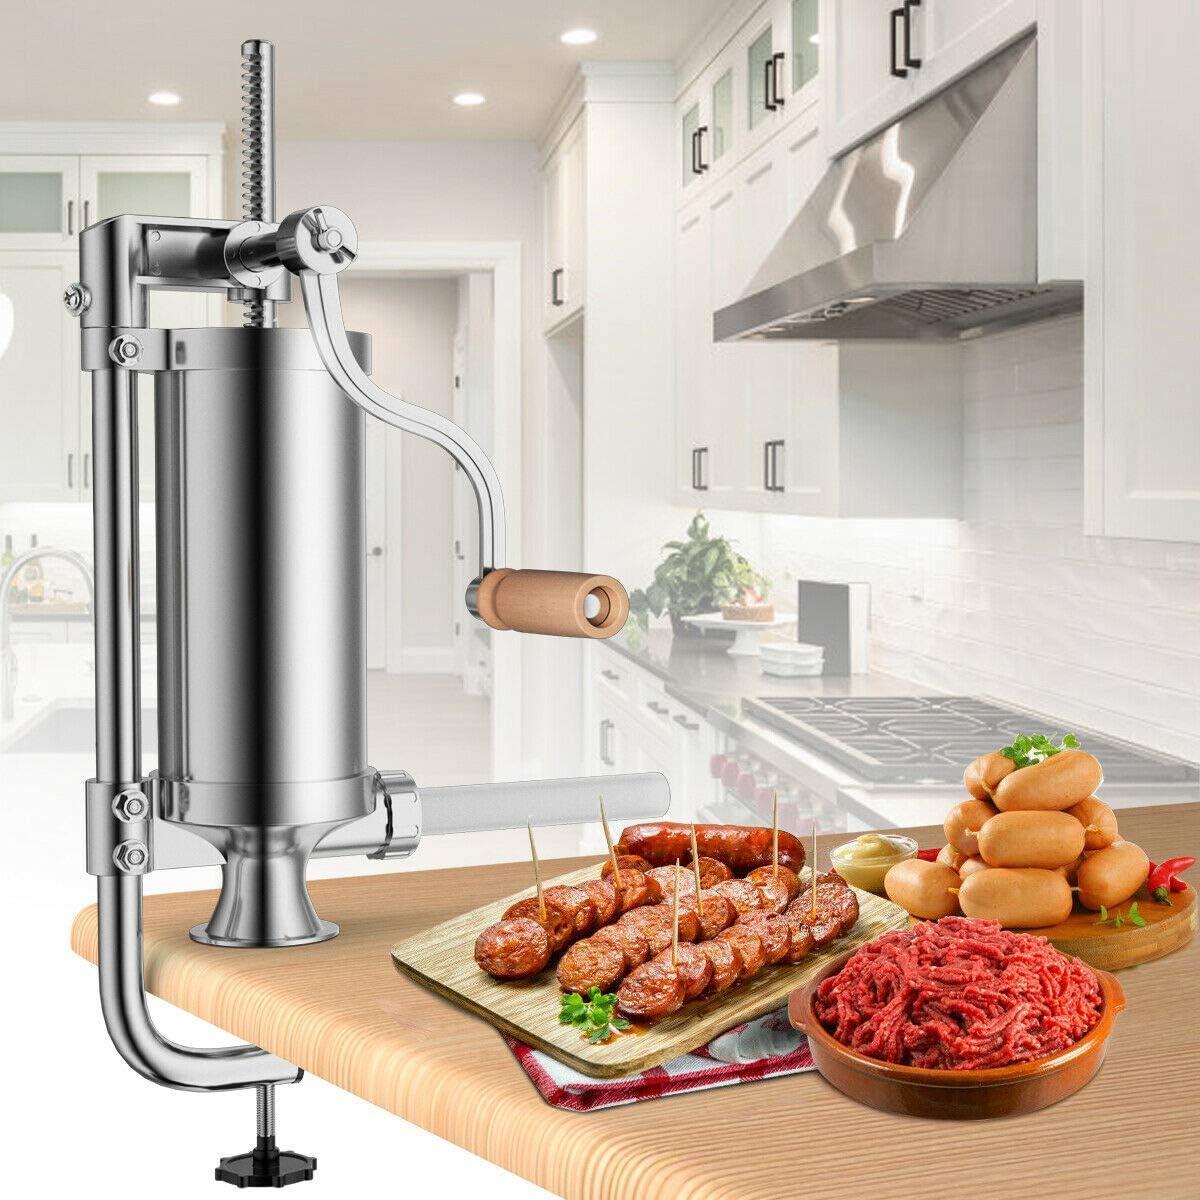 Songlela Manual Sausage Filler Maker, Meat Stuffer Filler Hand Operated Machine Silver, #2-2.5